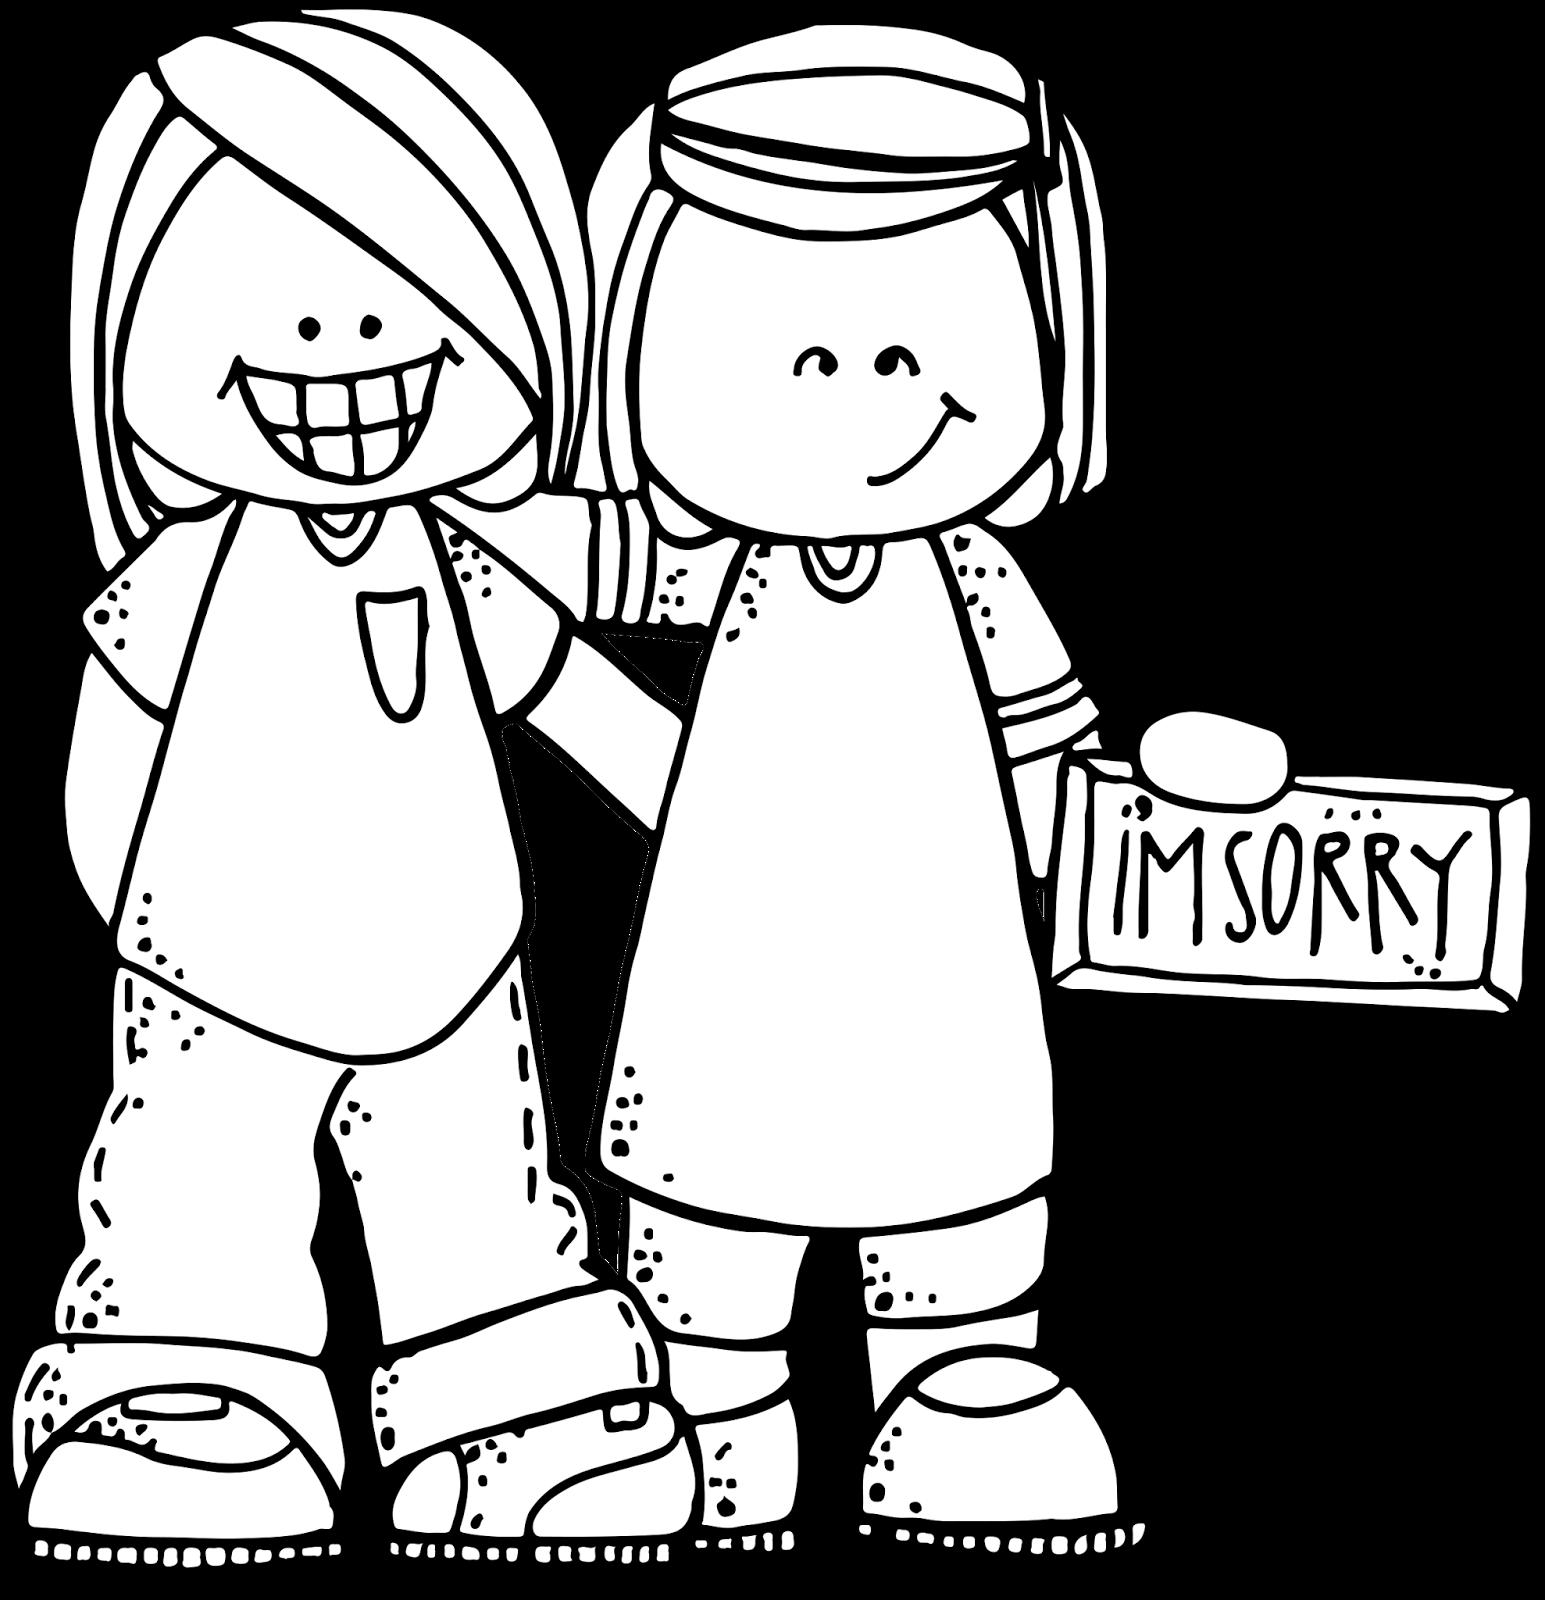 Forgive alternative design day. Lds clipart forgiveness